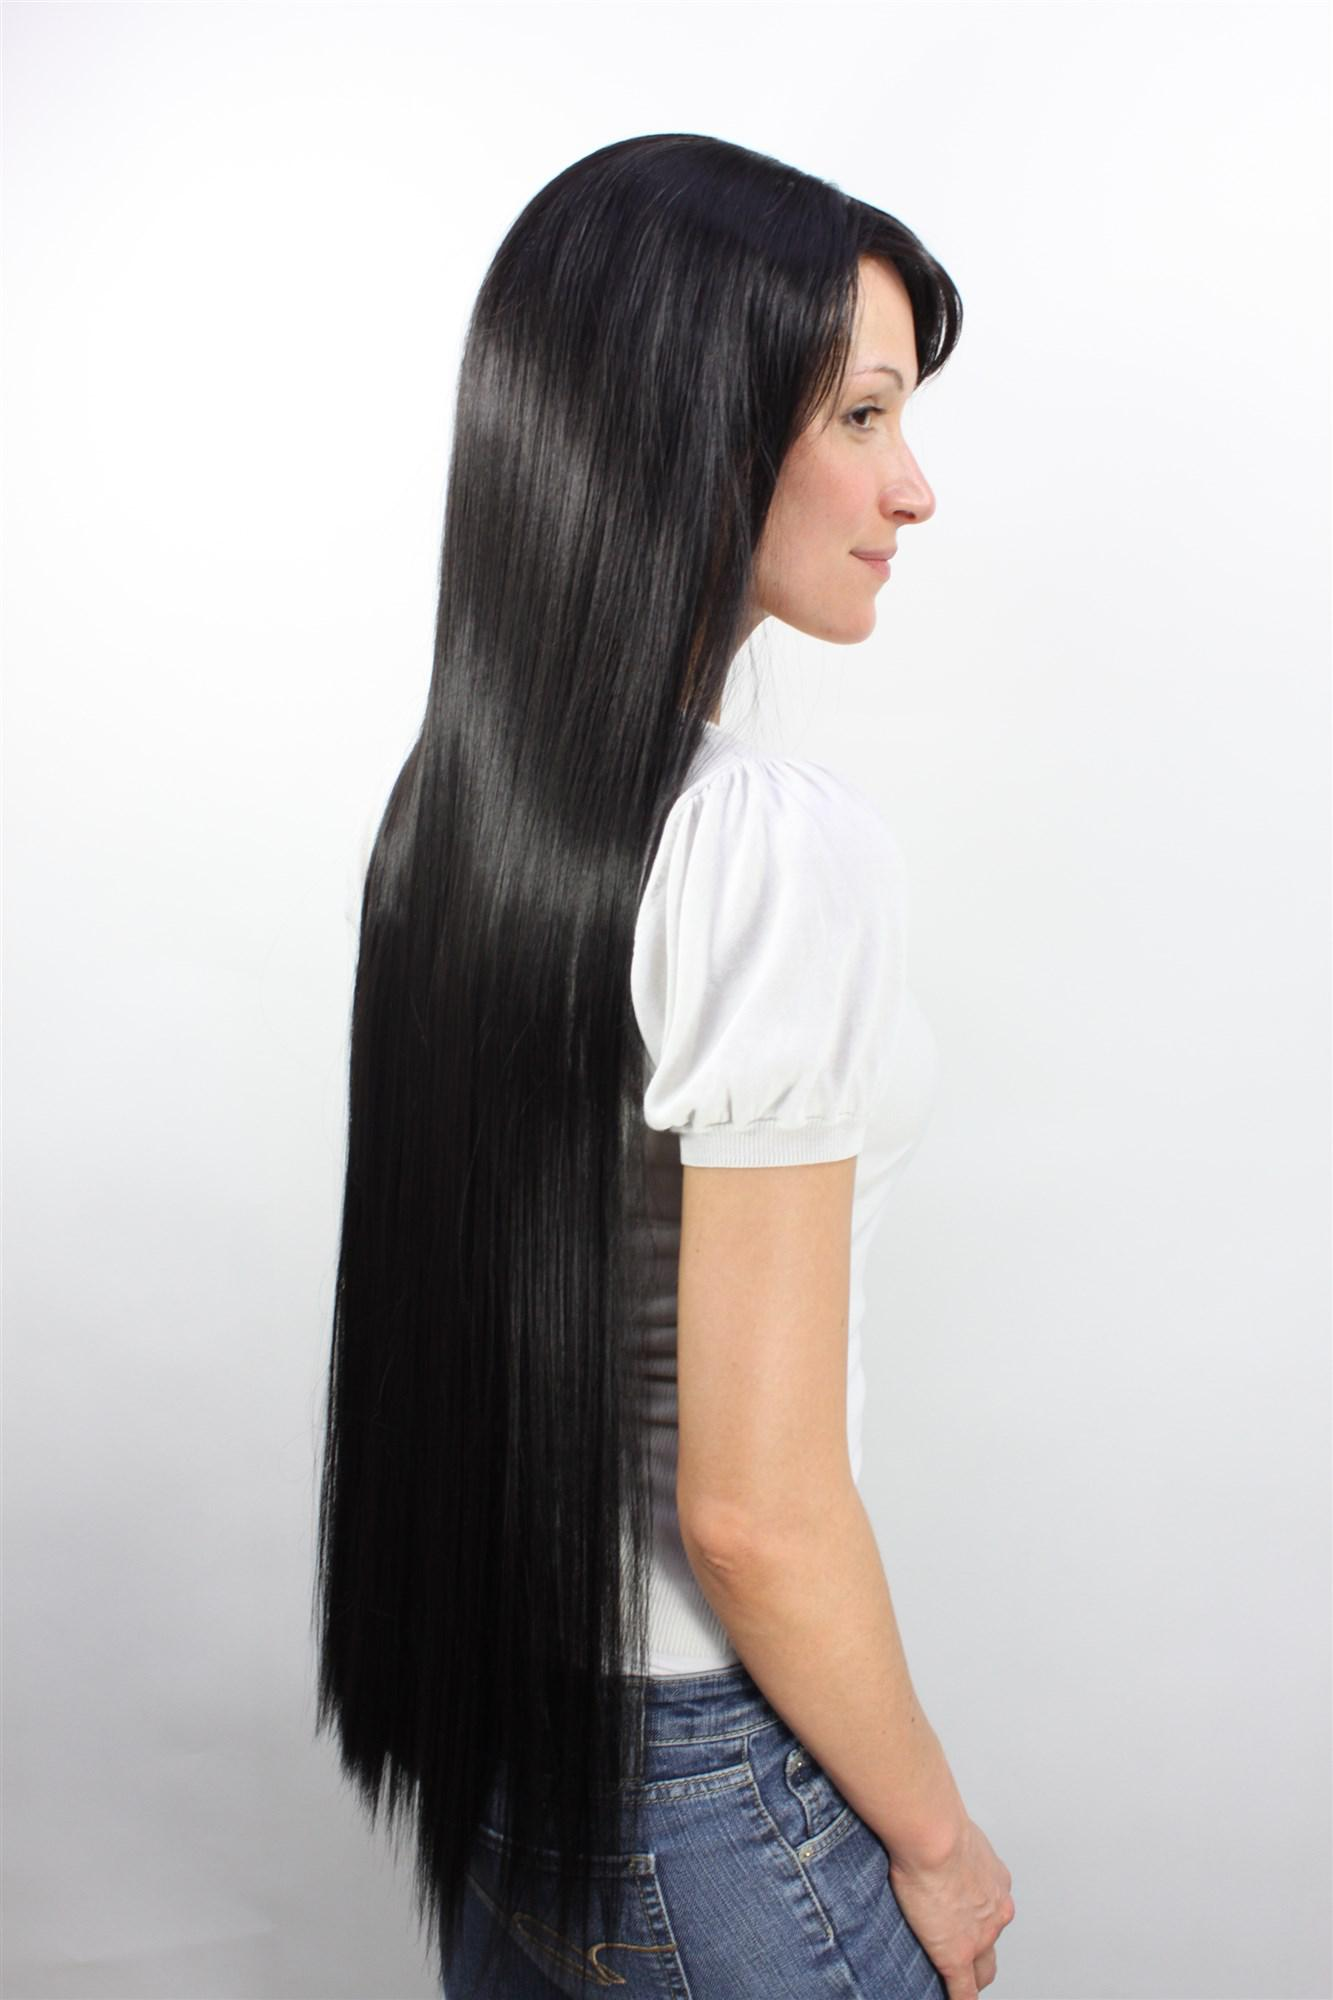 Ebenholz Haare & Perücken